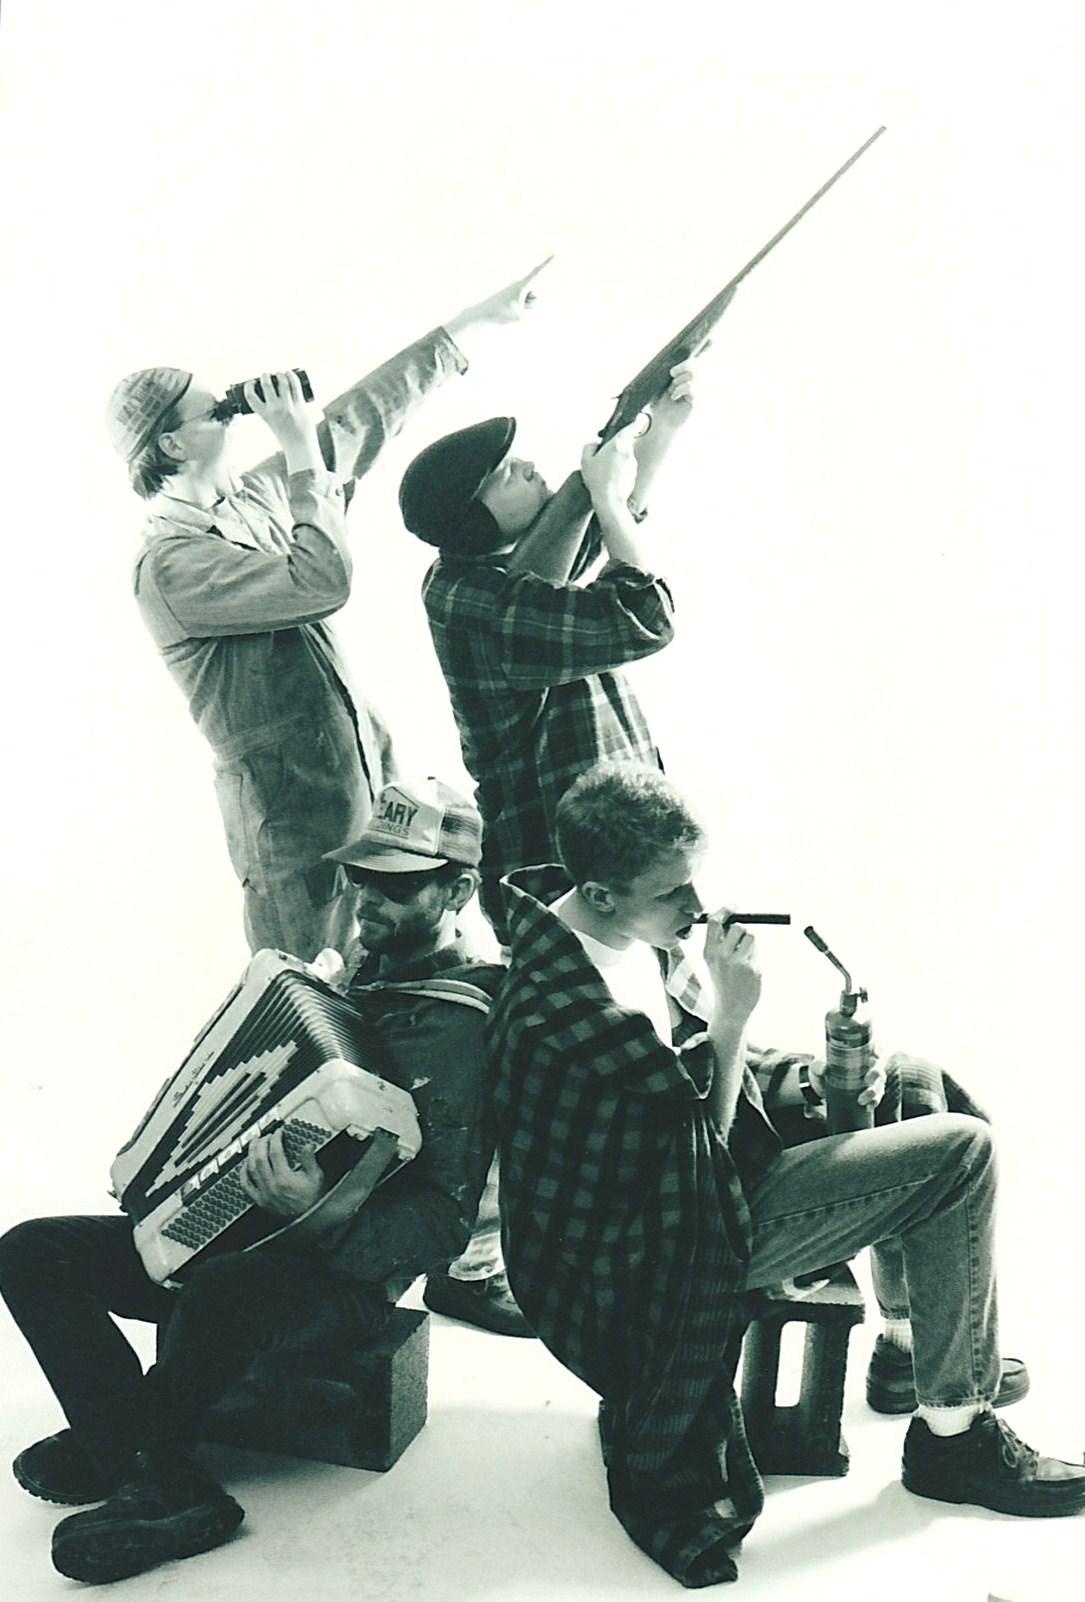 Flyover Land Cover Shoot, Spring 1995